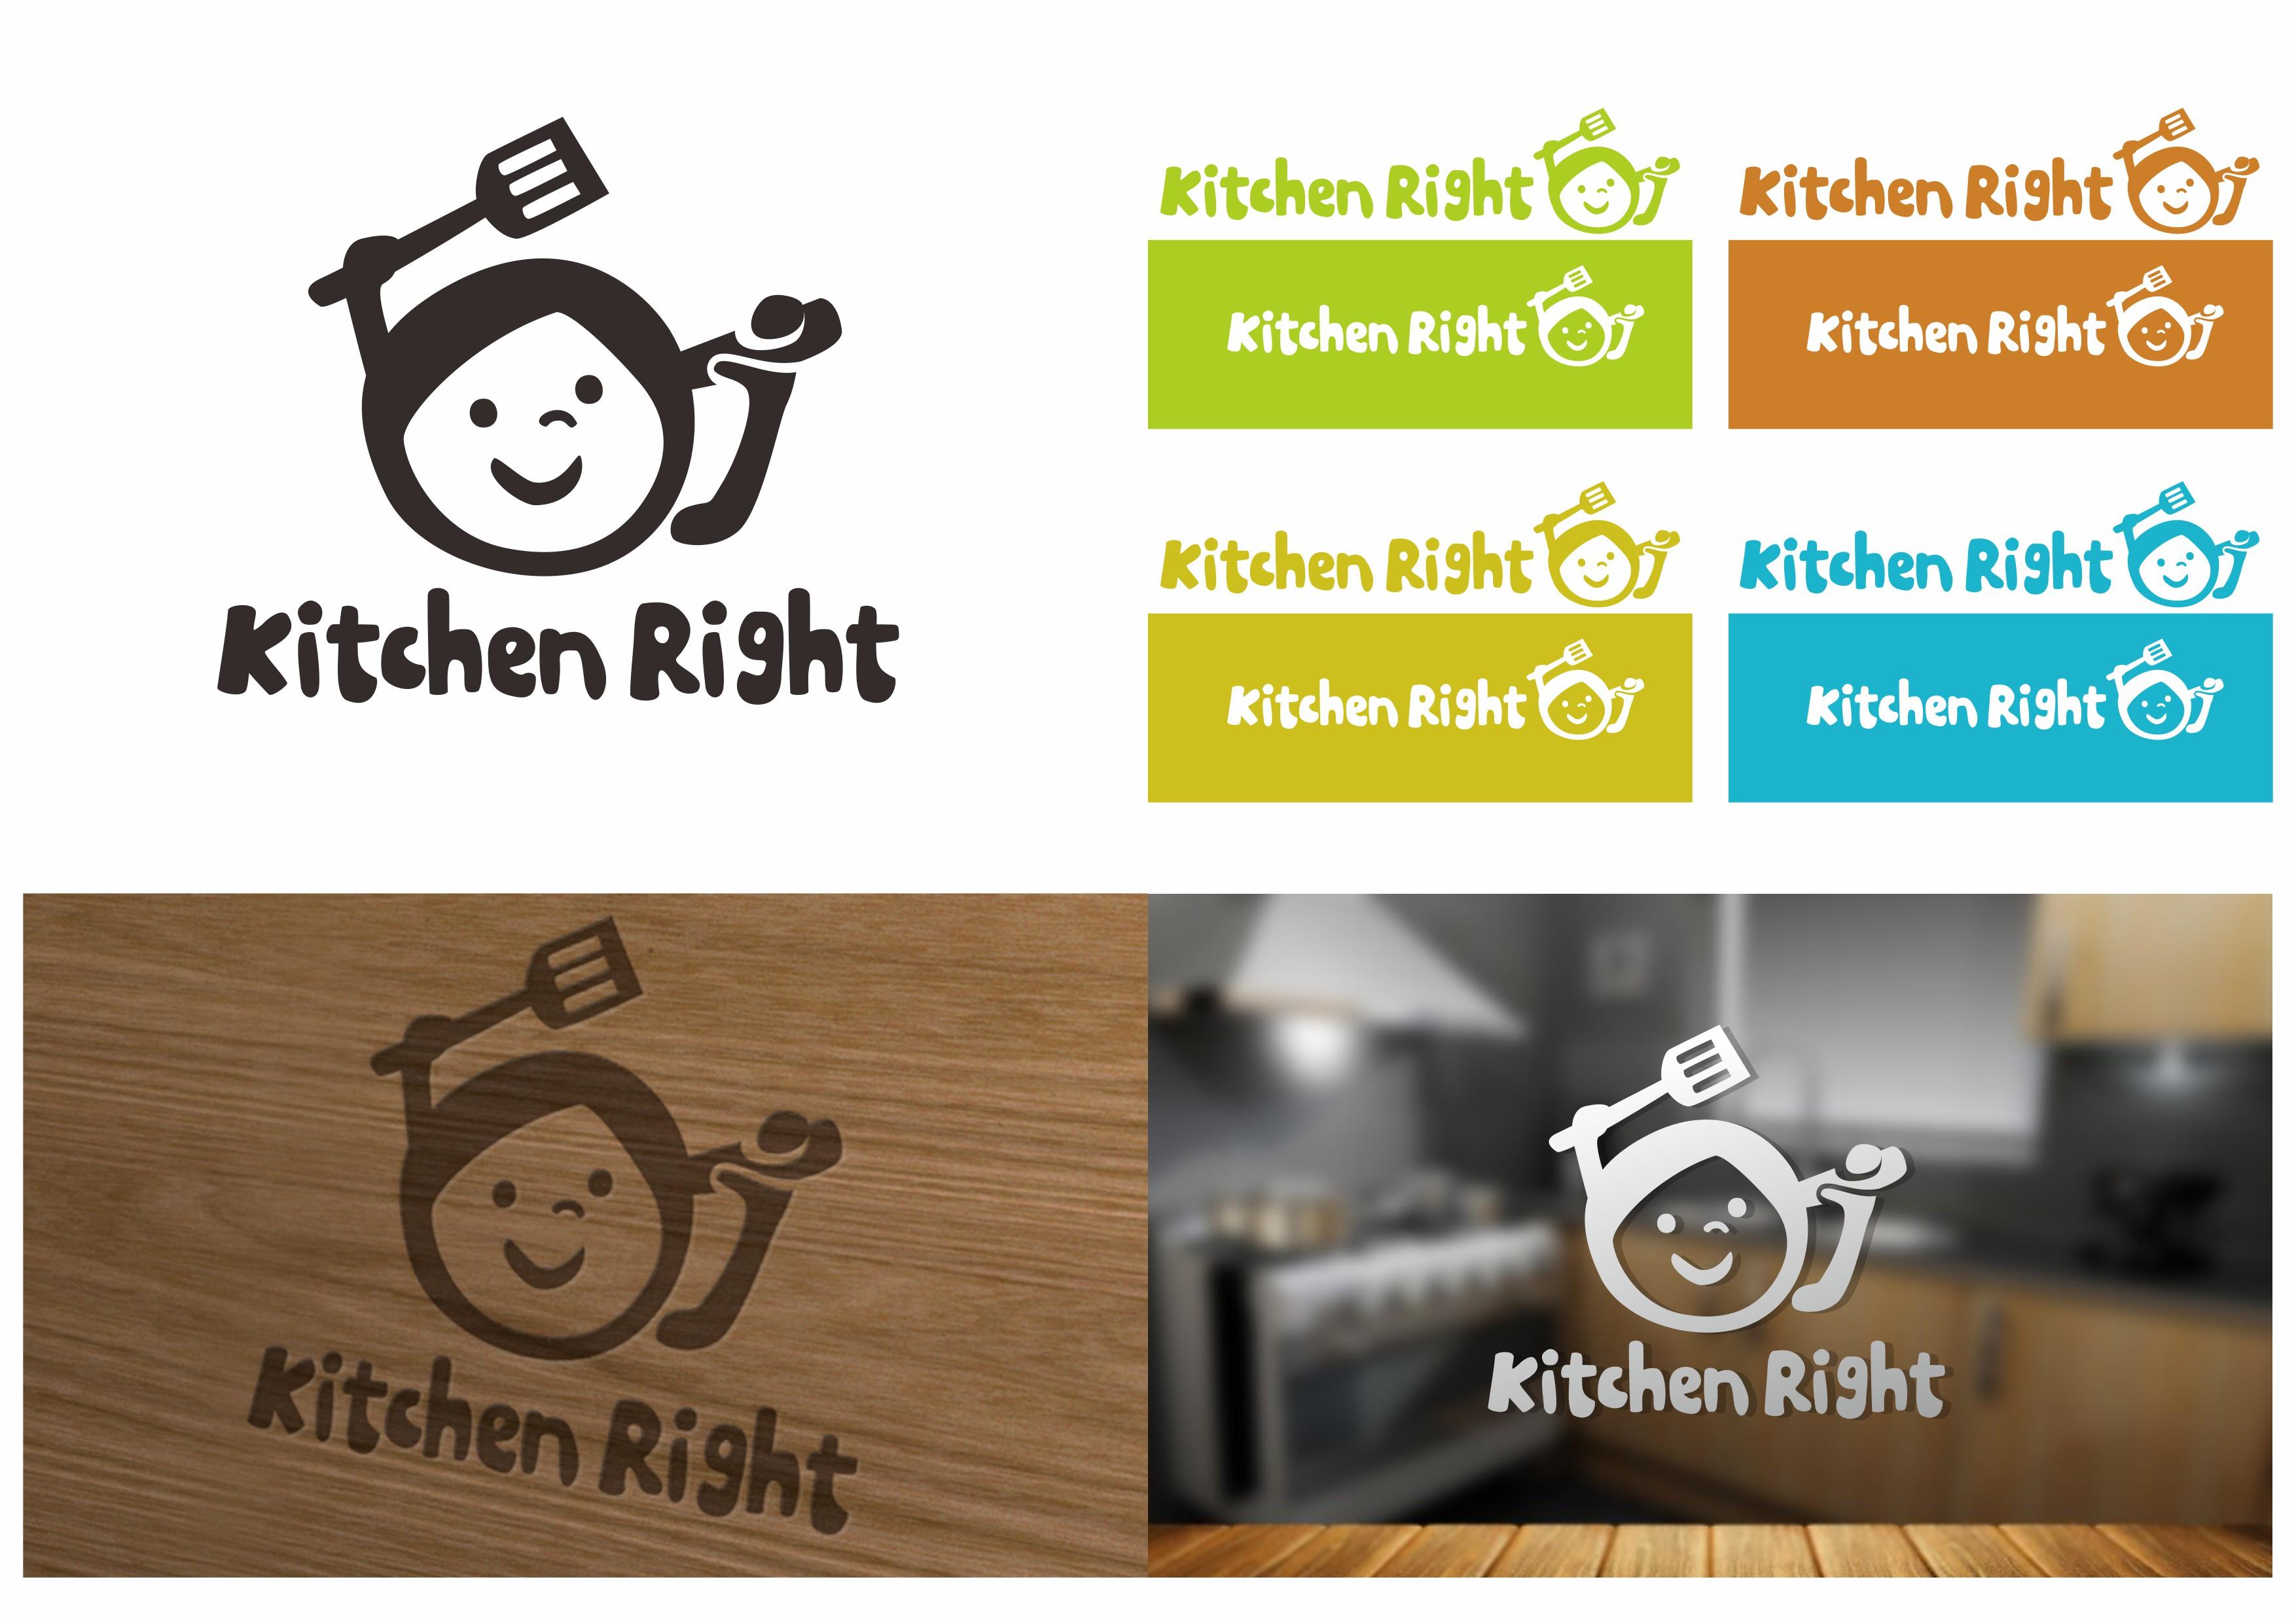 Kitchen Right